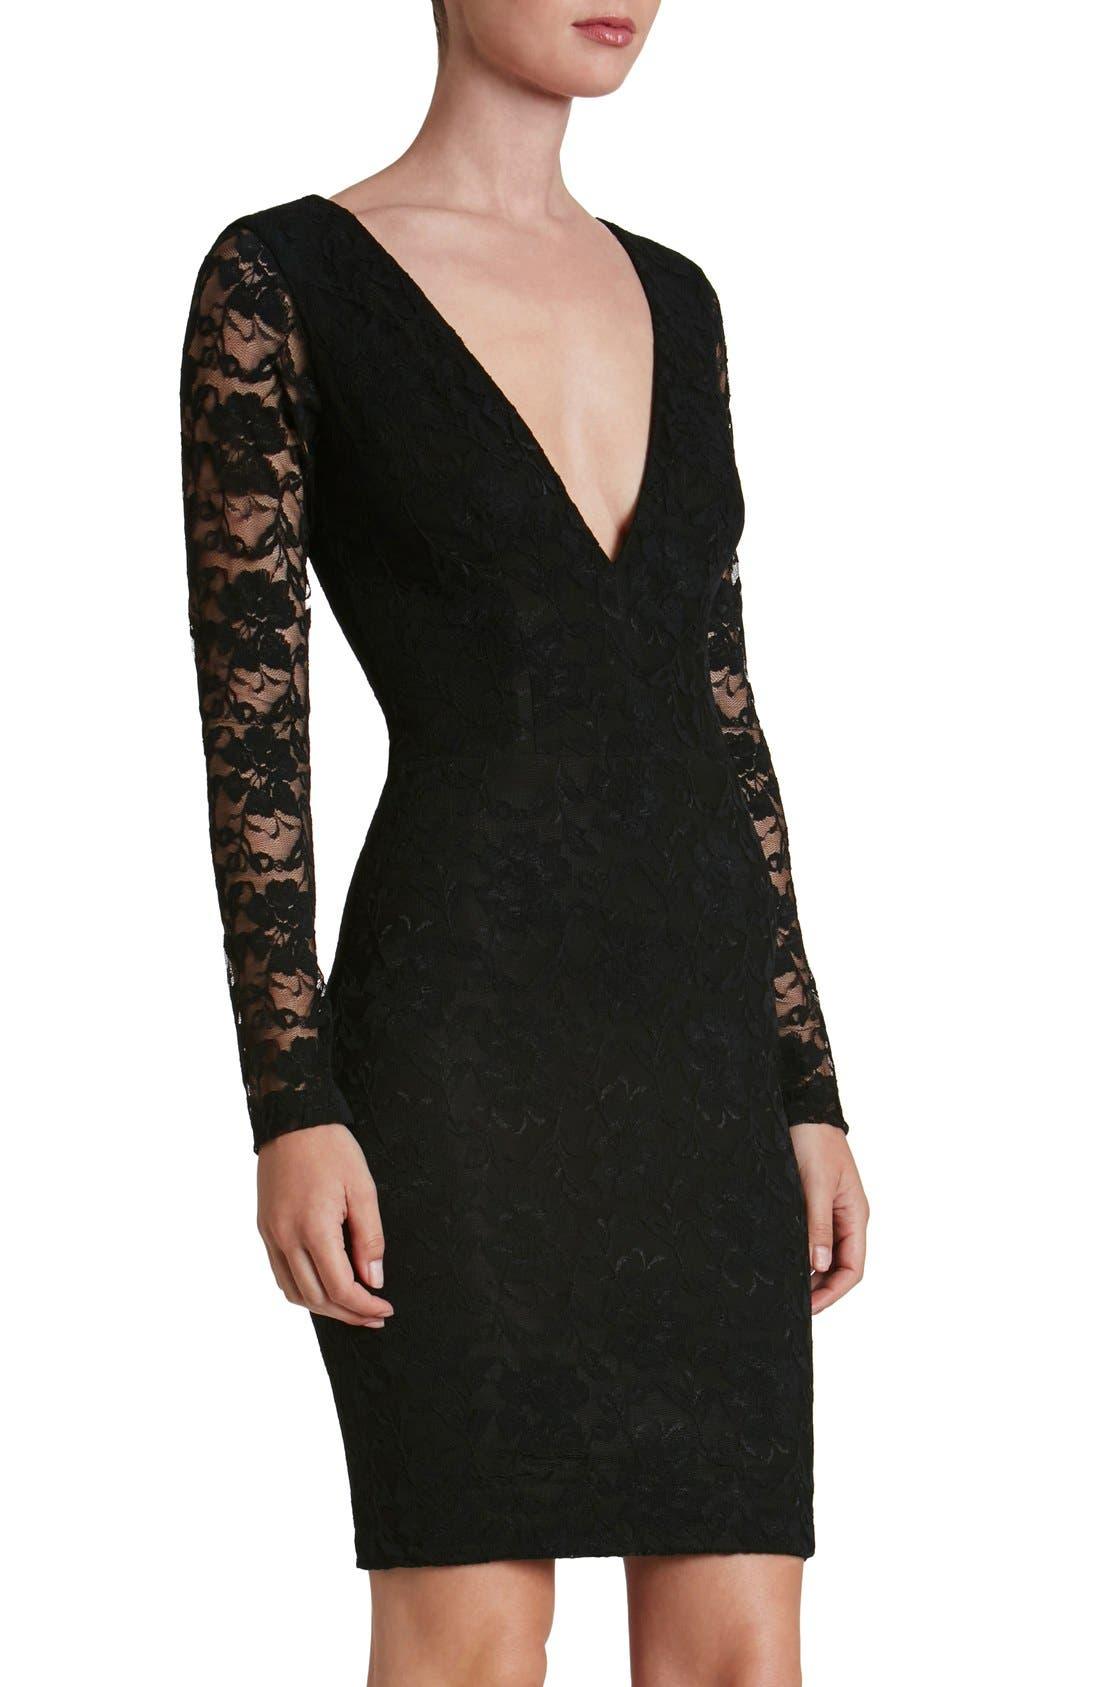 'Erica' Plunge Neck Lace Body-Con Dress,                         Main,                         color, Black/ Black